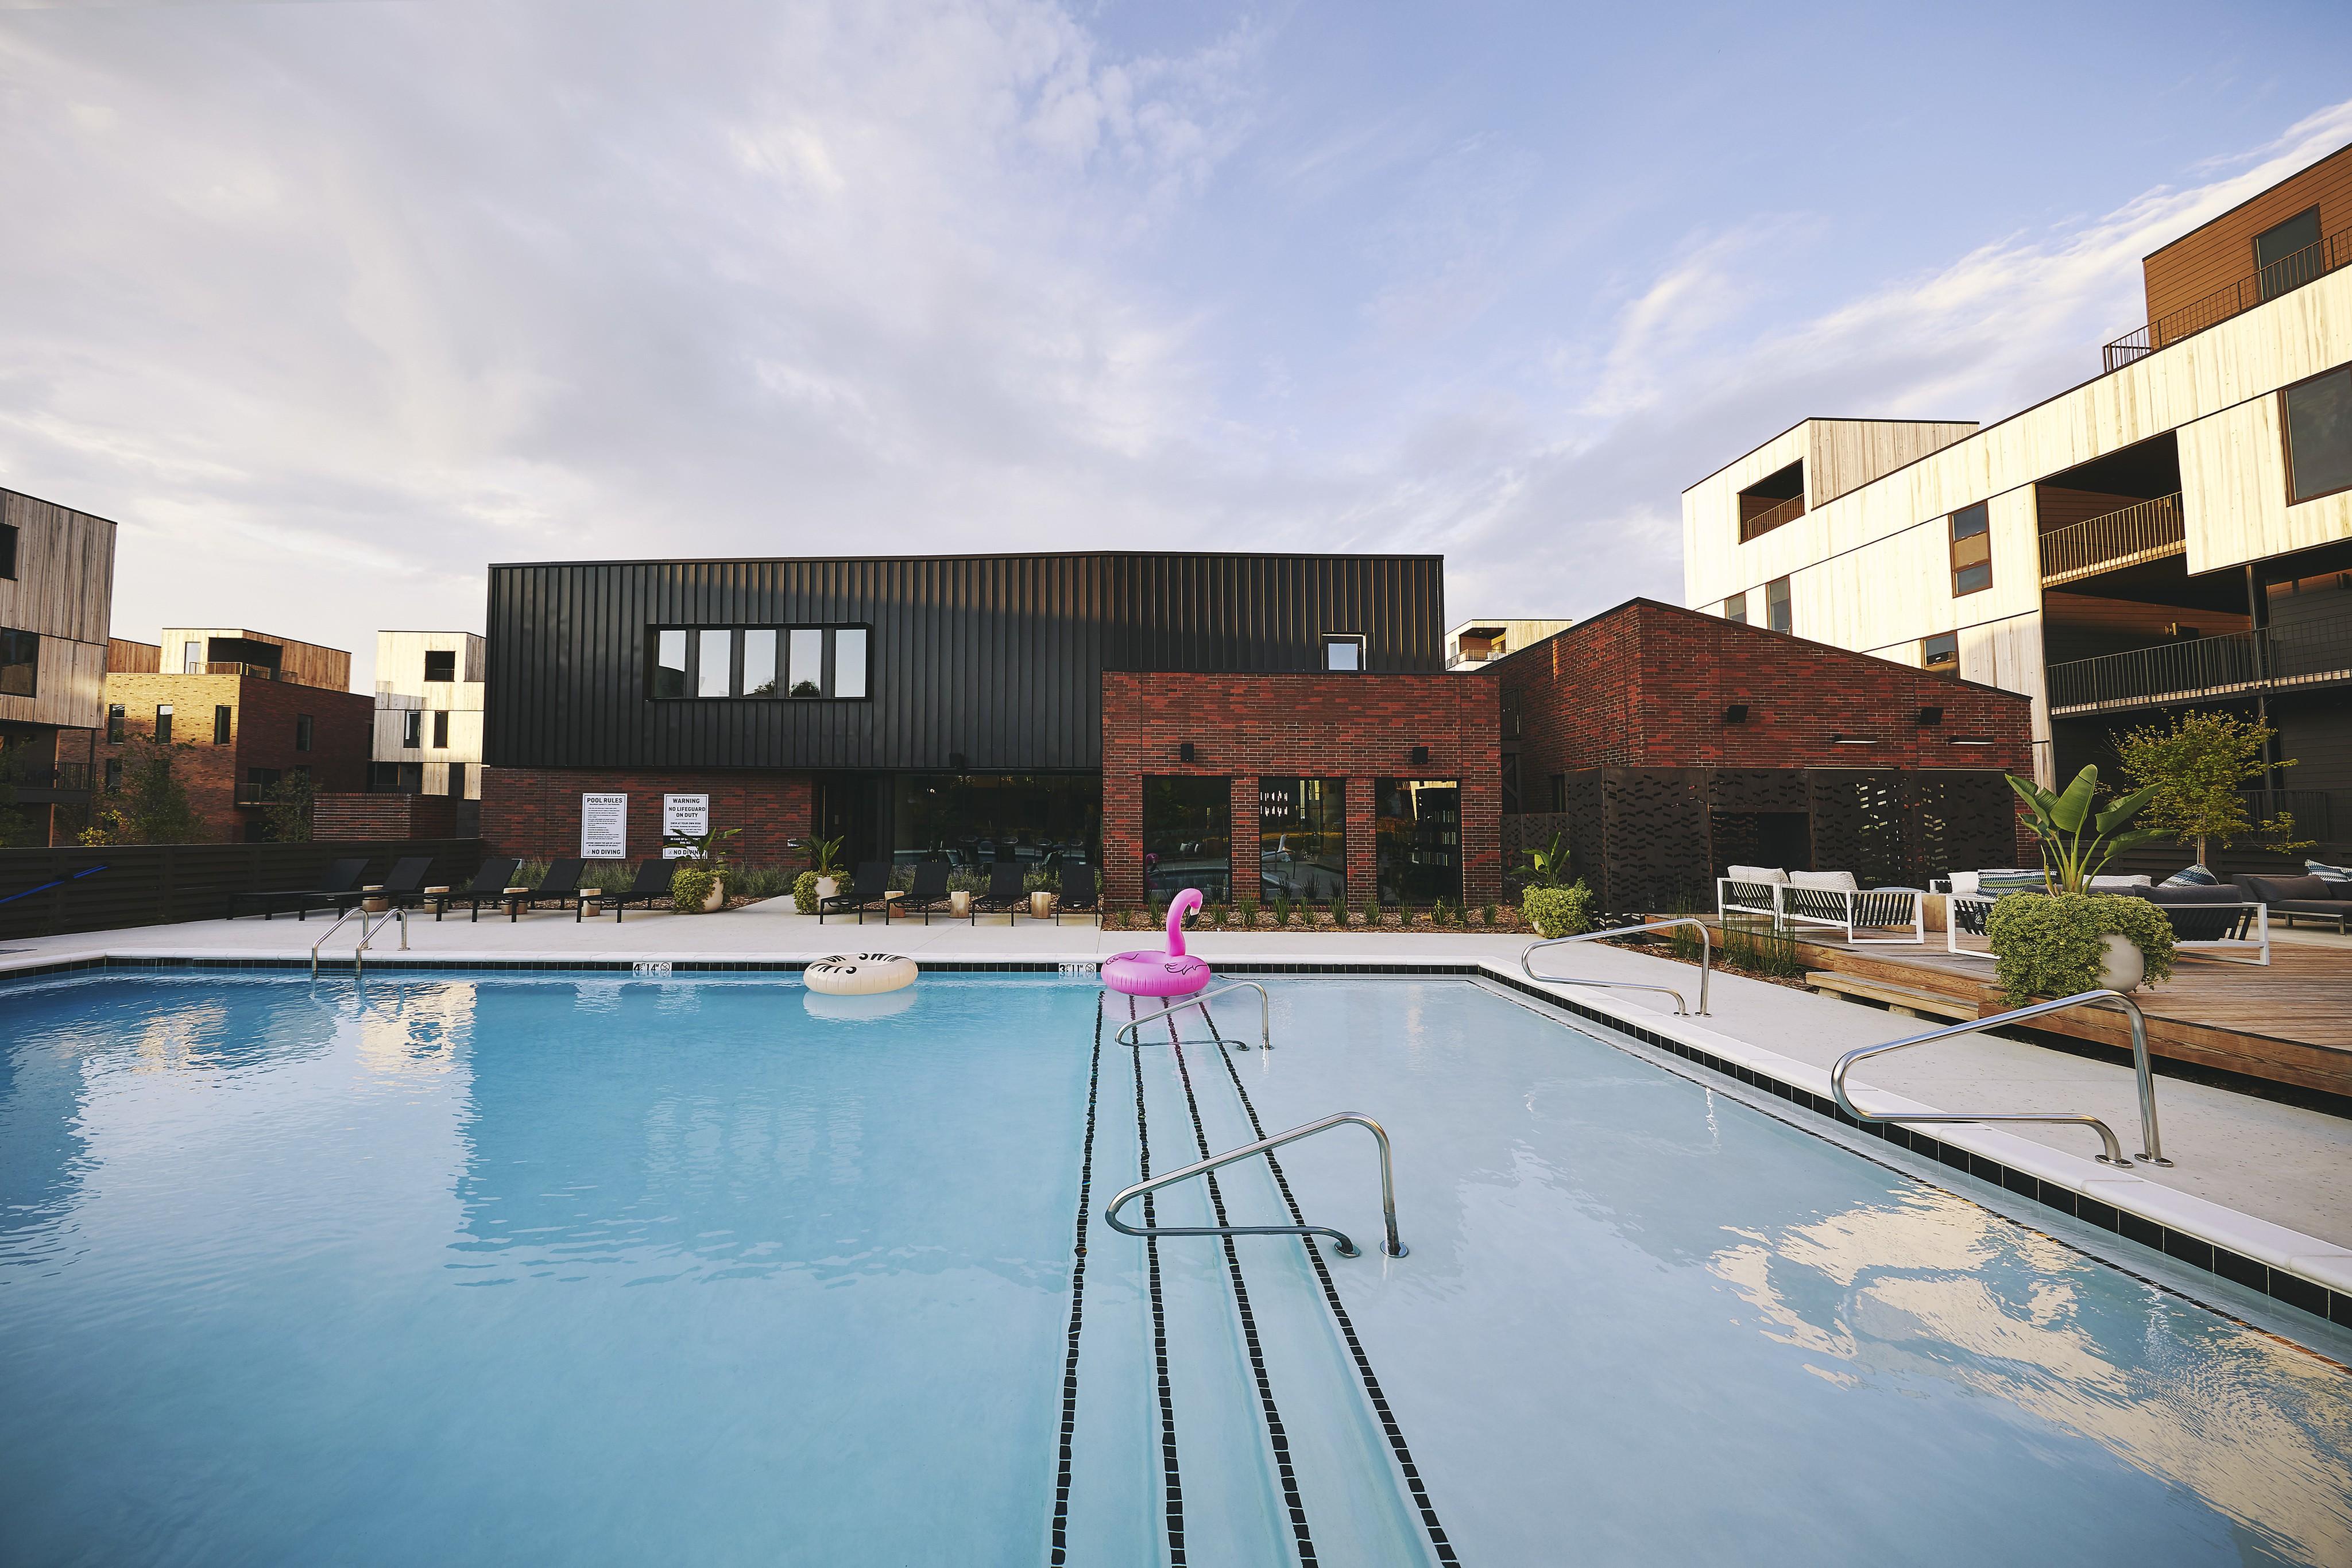 Apartments Near Arkansas Brick Avenue Lofts for Arkansas Students in , AR